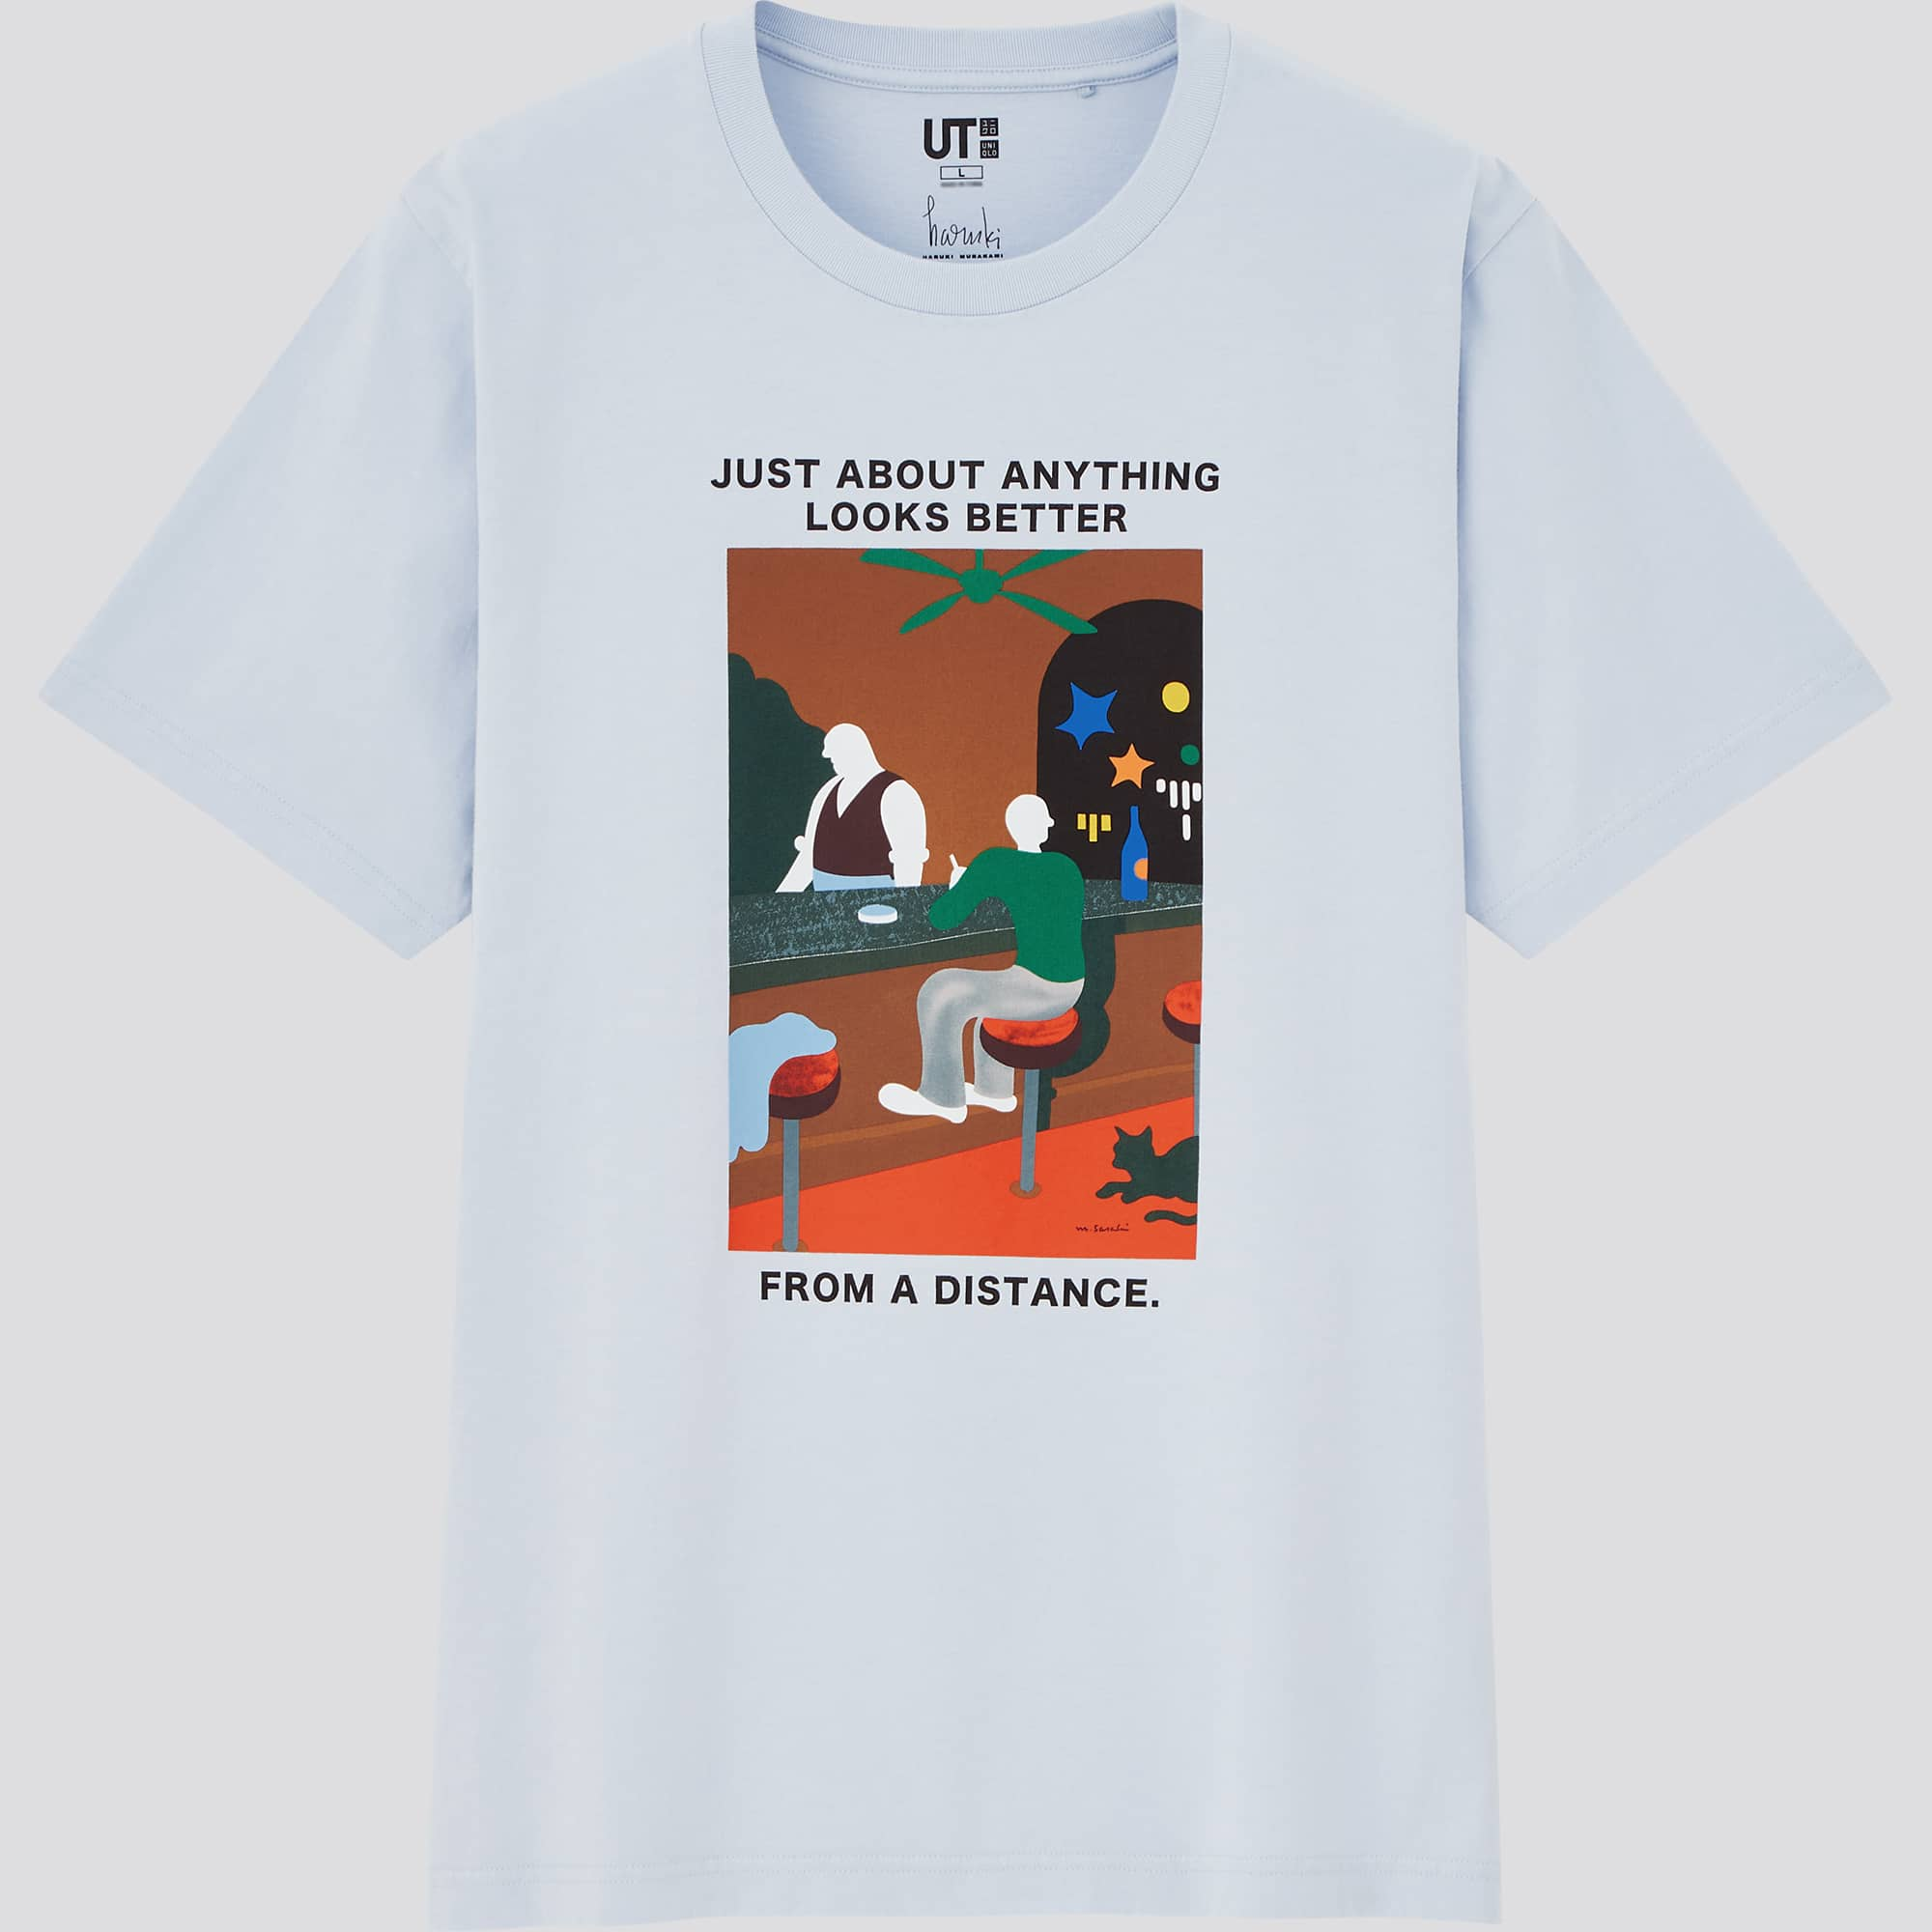 Uniqlo brings the creative world of Haruki Murakami to its new UT collection 12